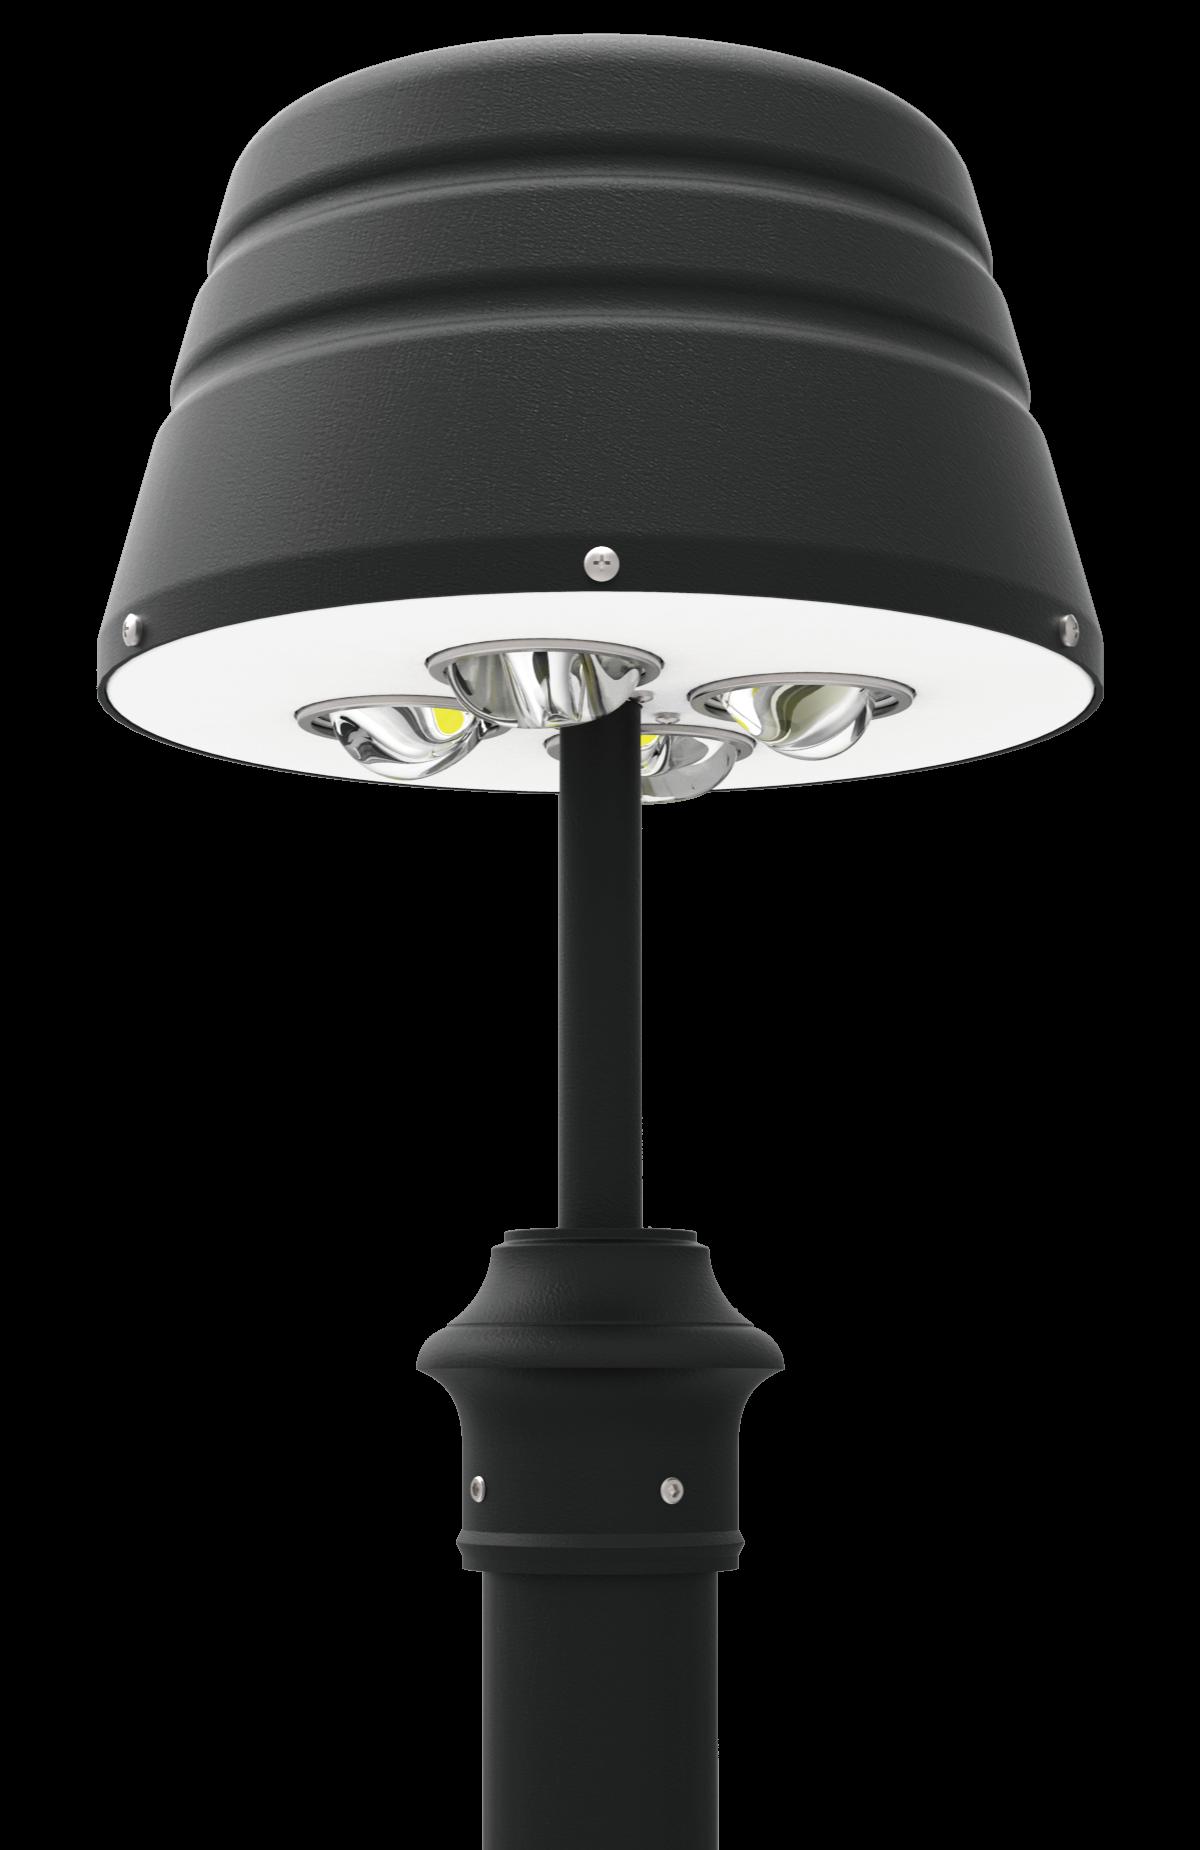 Try Duke Light Led Post Top Light Fixtures Discover Duke Light 39 S Portfolio Of Decorative Post Tops To Enhance Your Space App Light Fixtures Fixtures Light